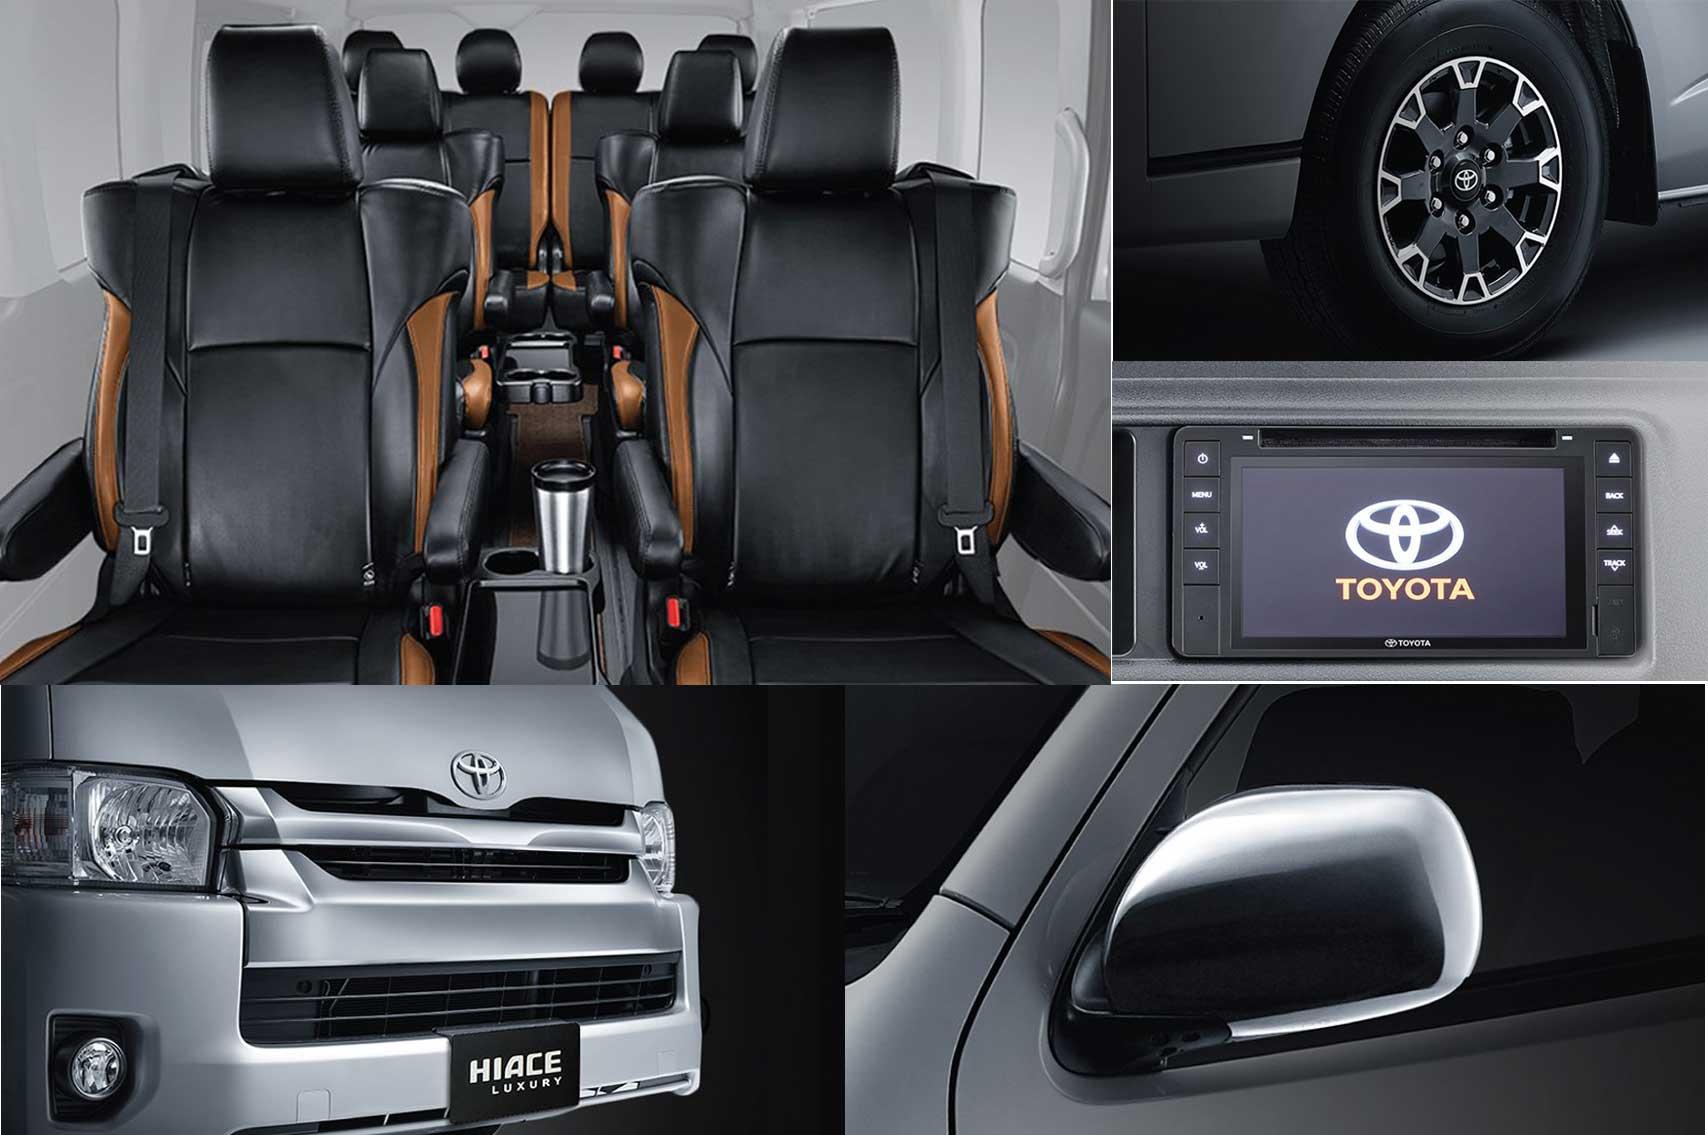 Spesifikasi dan interior toyota hiace luxury